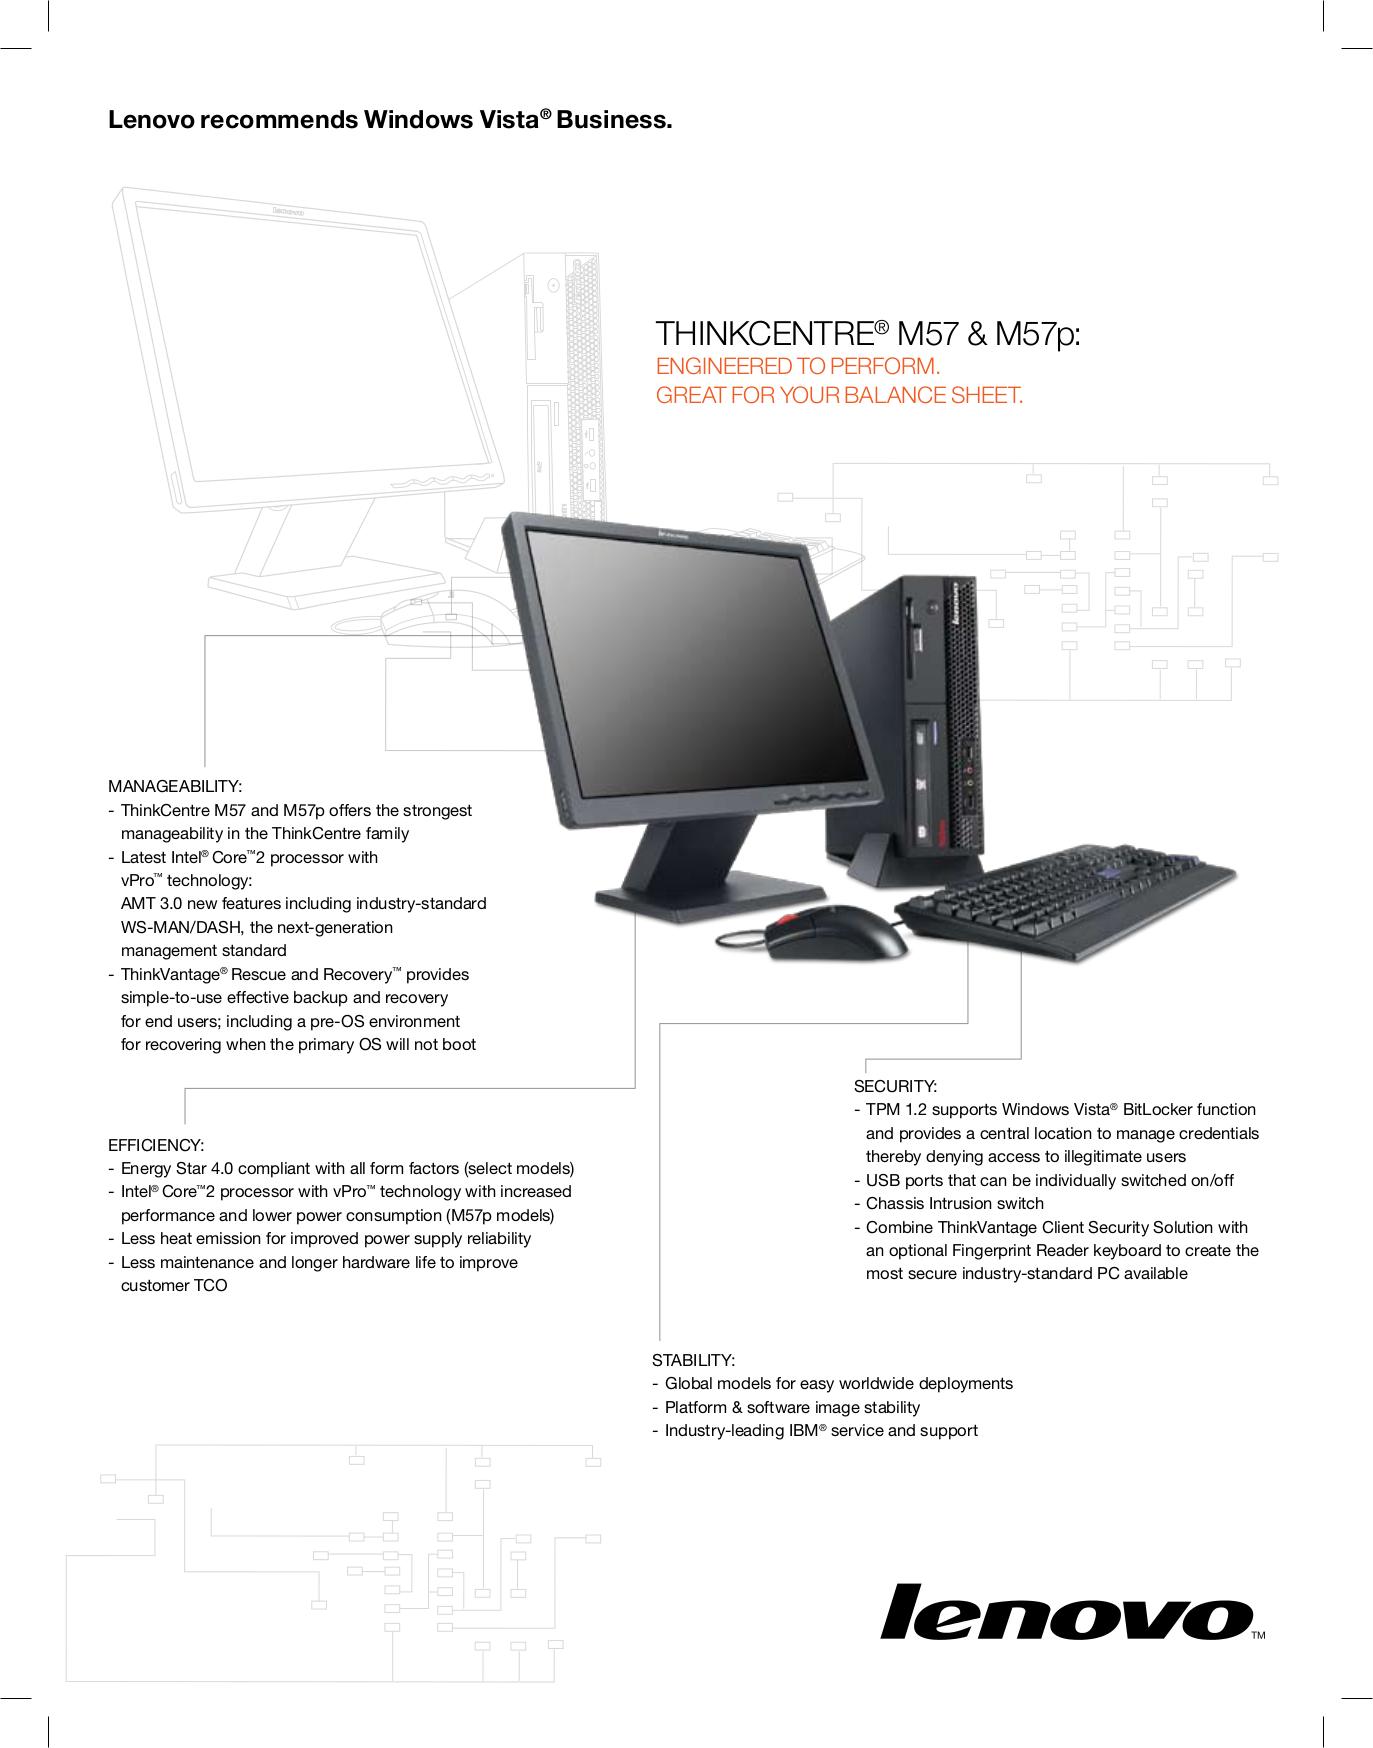 pdf for Lenovo Desktop ThinkCentre M57 6076 manual